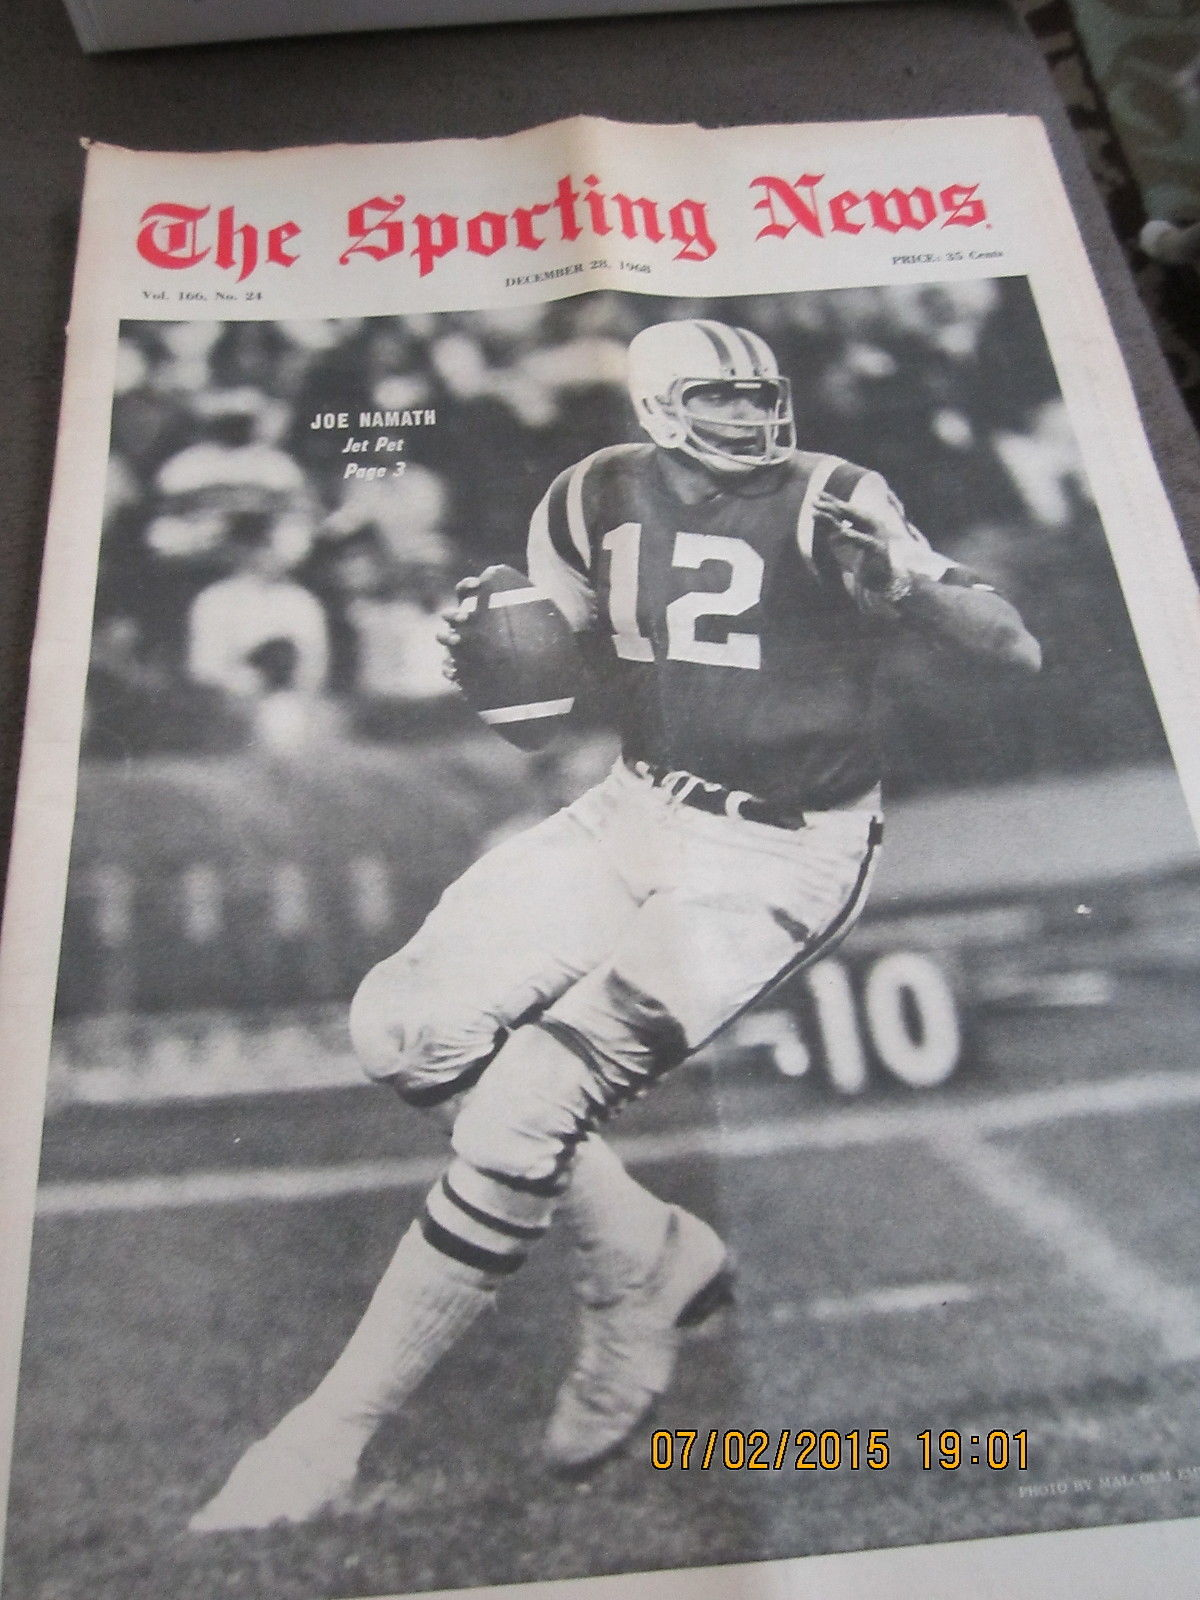 12/28 1968 The Sporting News Joe Namath New York Jets